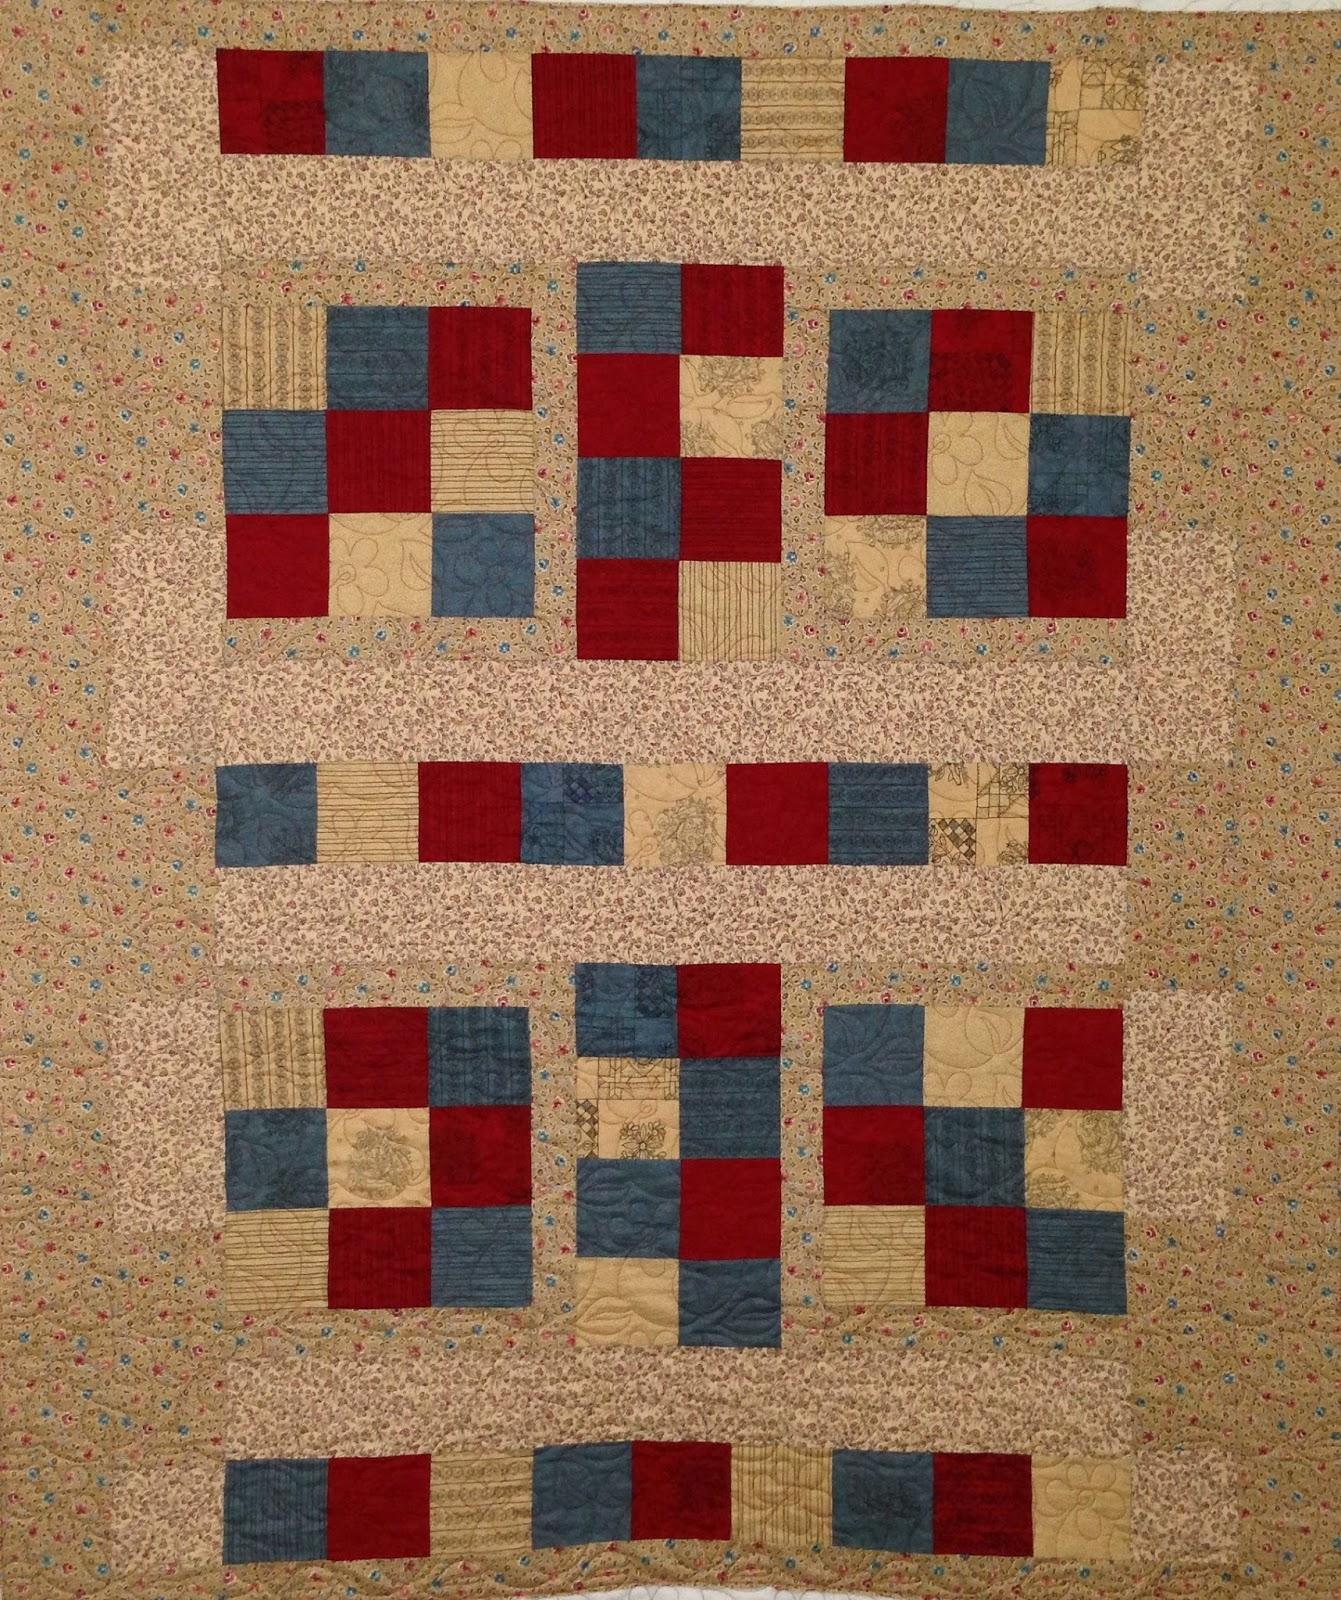 Laura Joy's Geometric Quilt